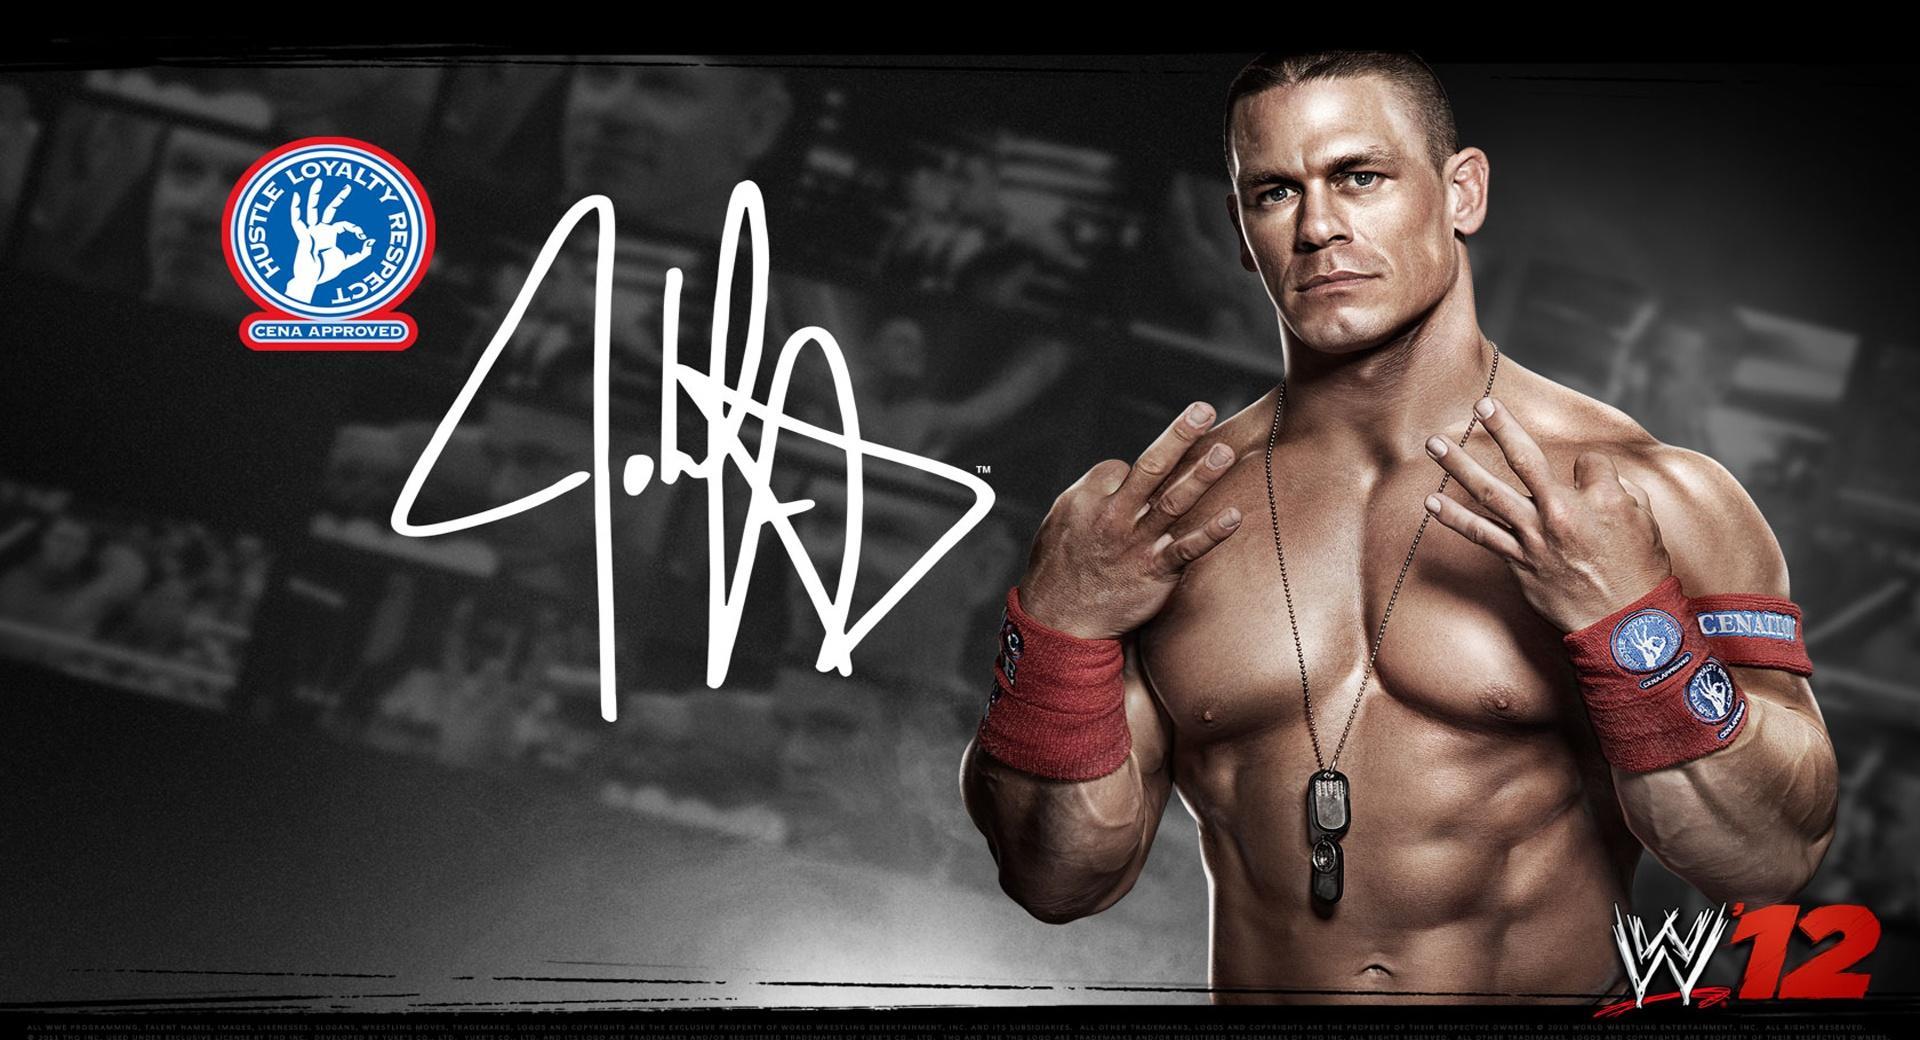 John-Cena_WWE12 wallpapers HD quality